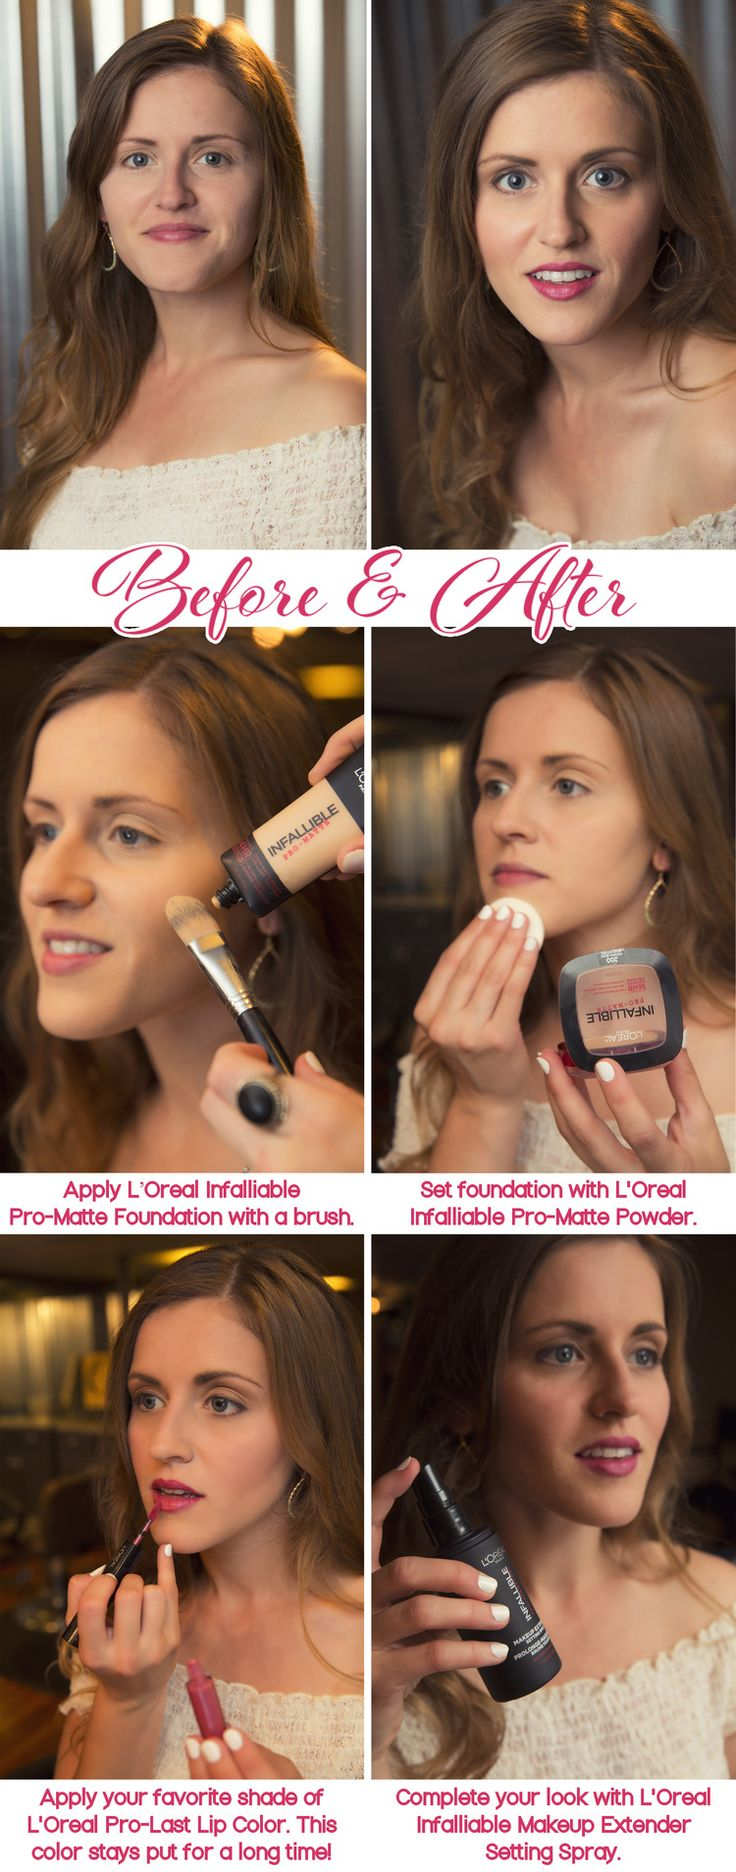 L'Oreal Makeup Tutorial